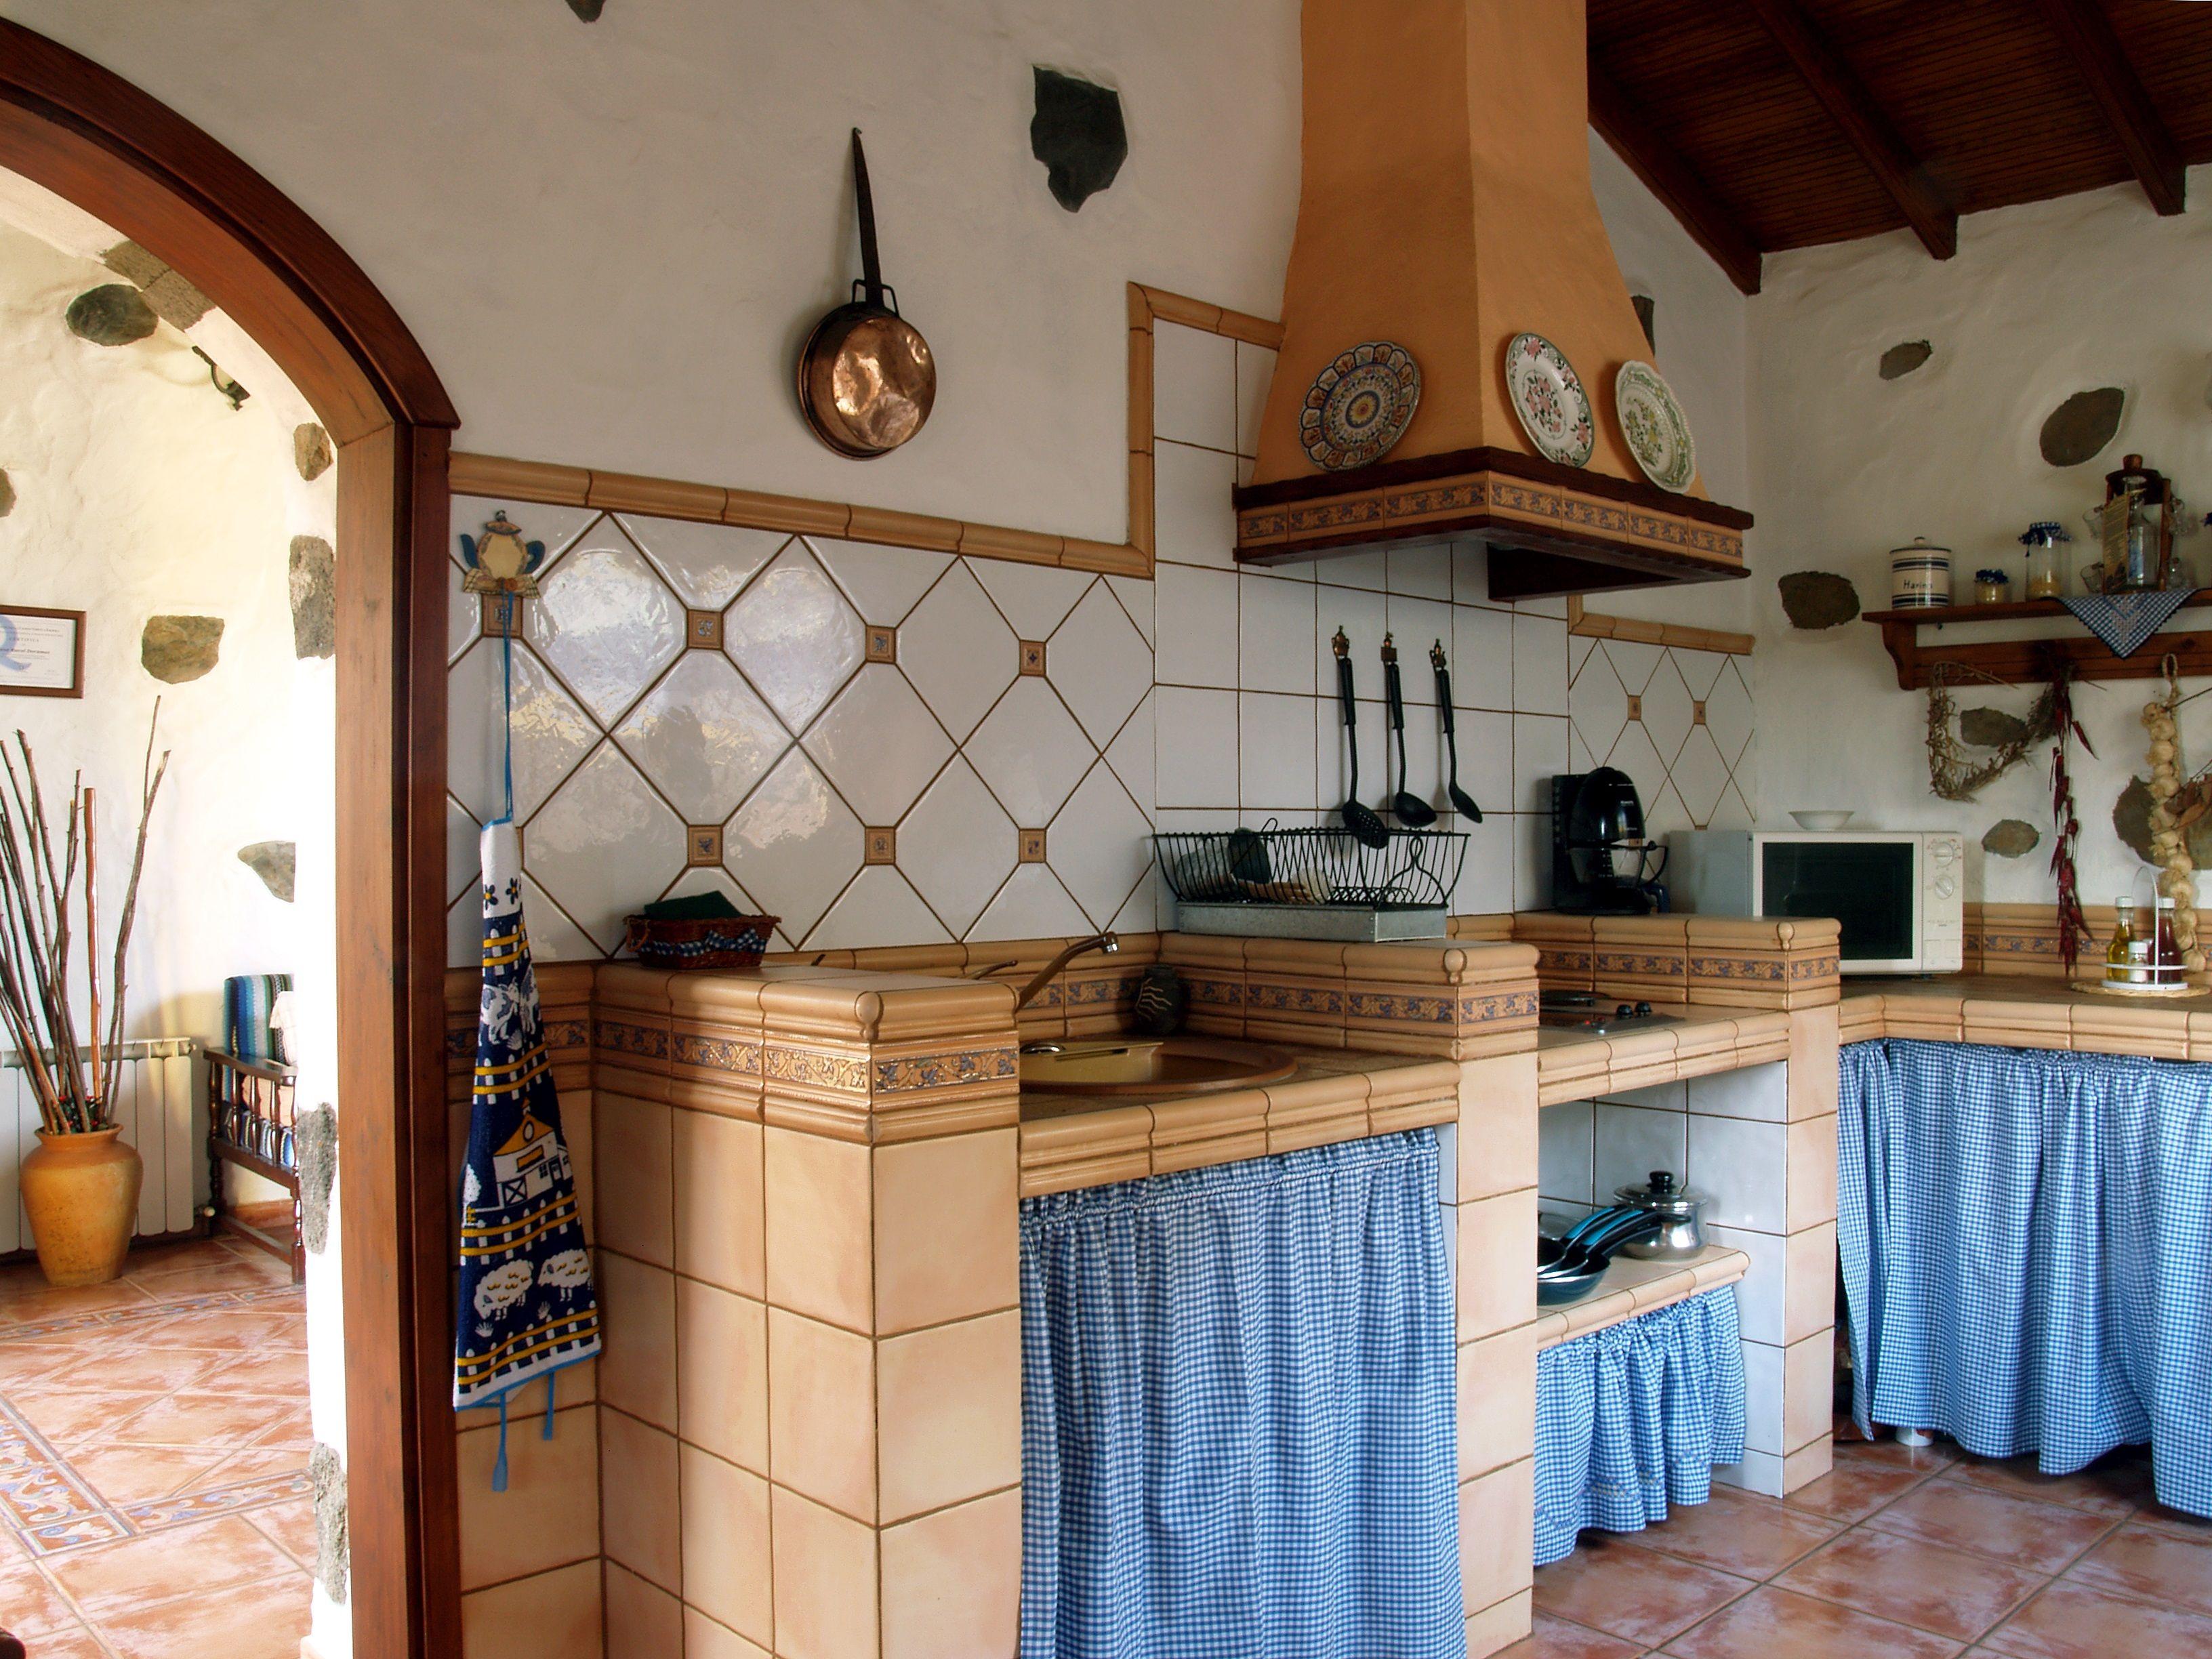 Cocina casa rural doramas pinterest cocinas cocinas - Cocinas rusticas de campo ...